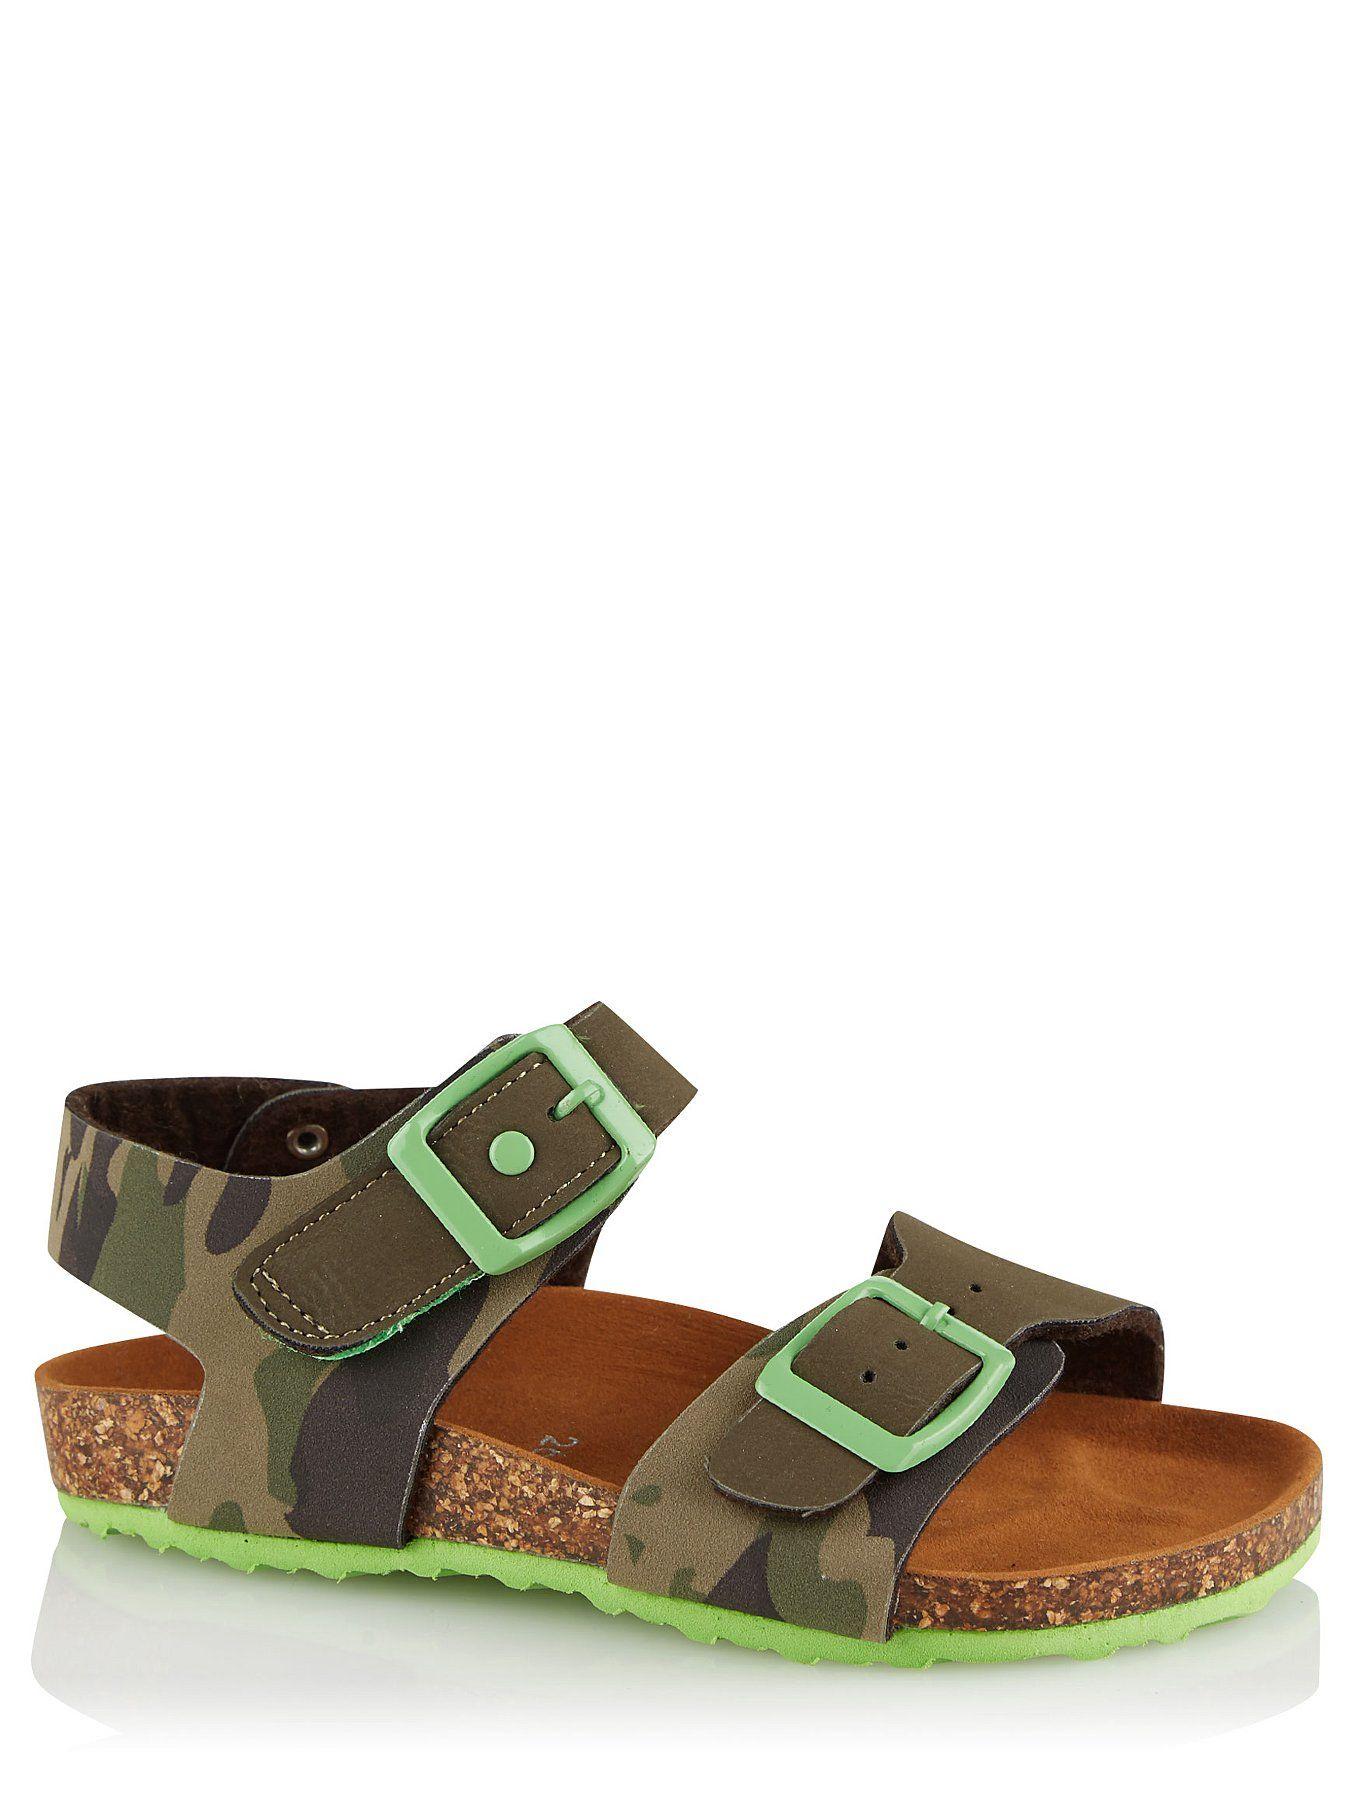 Camo Print Sling Back Sandals   Kids